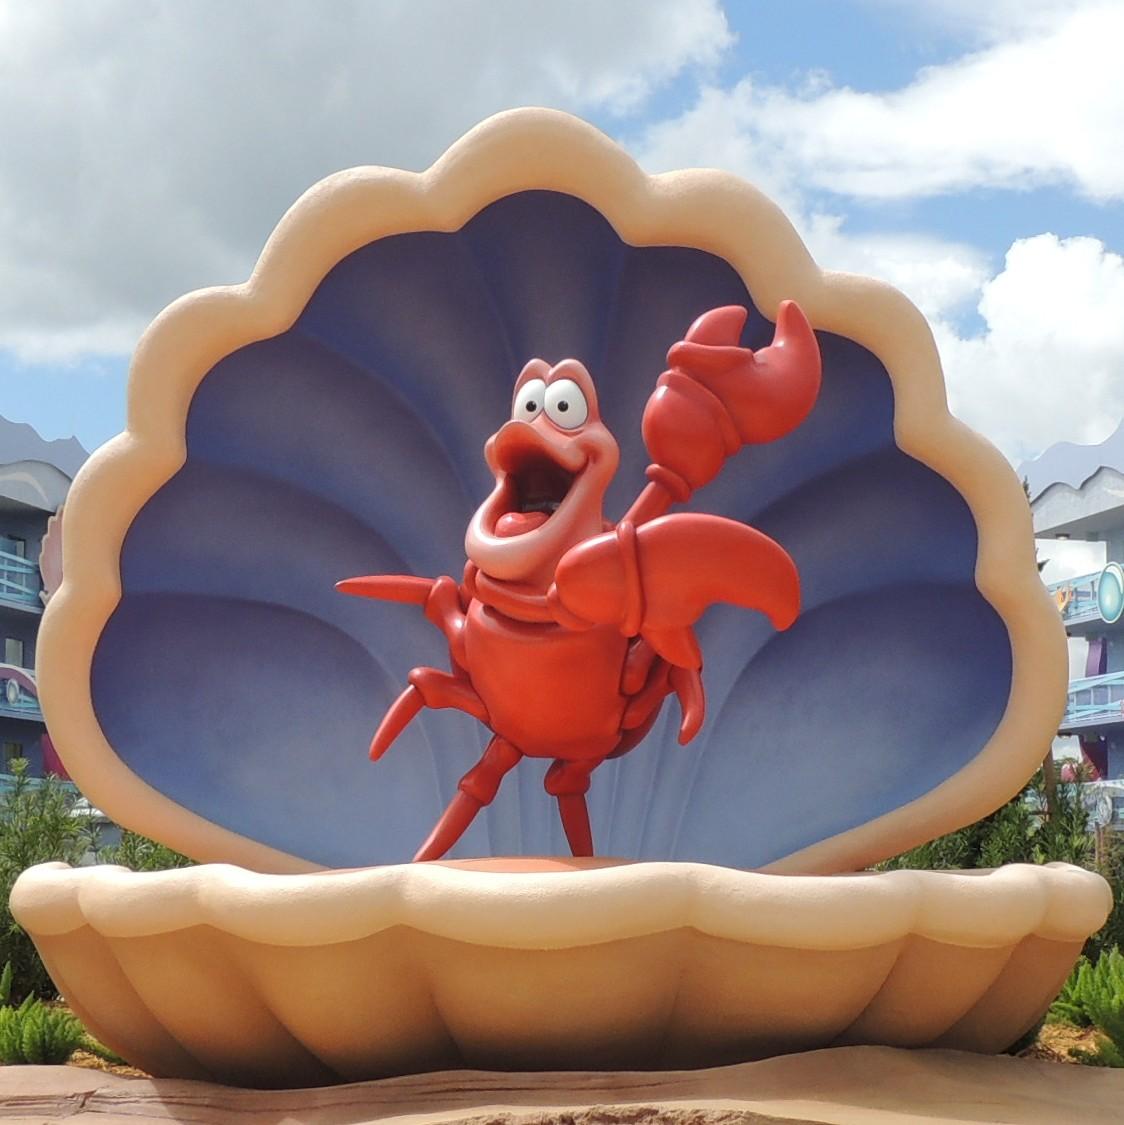 Sebastian, from the Little Mermaid, at Disney's Art of Animation Resort at Disney World.